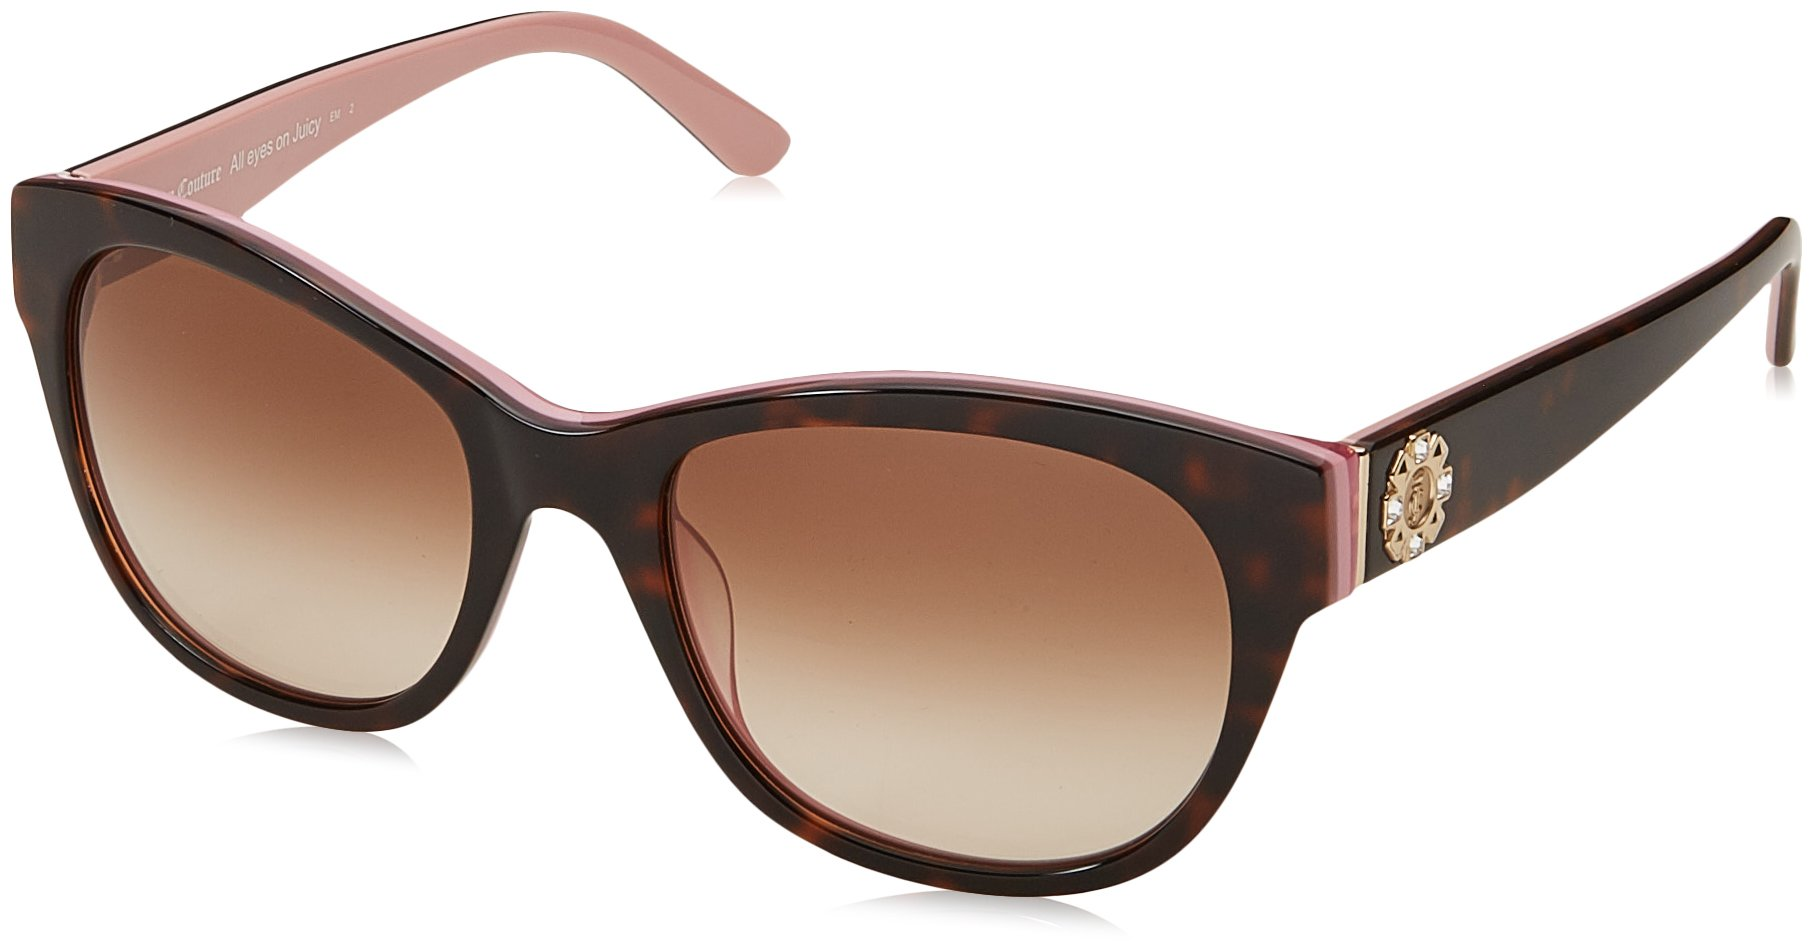 Juicy Couture Women's Ju 587/s Square Sunglasses, Havana Pink, 53 mm